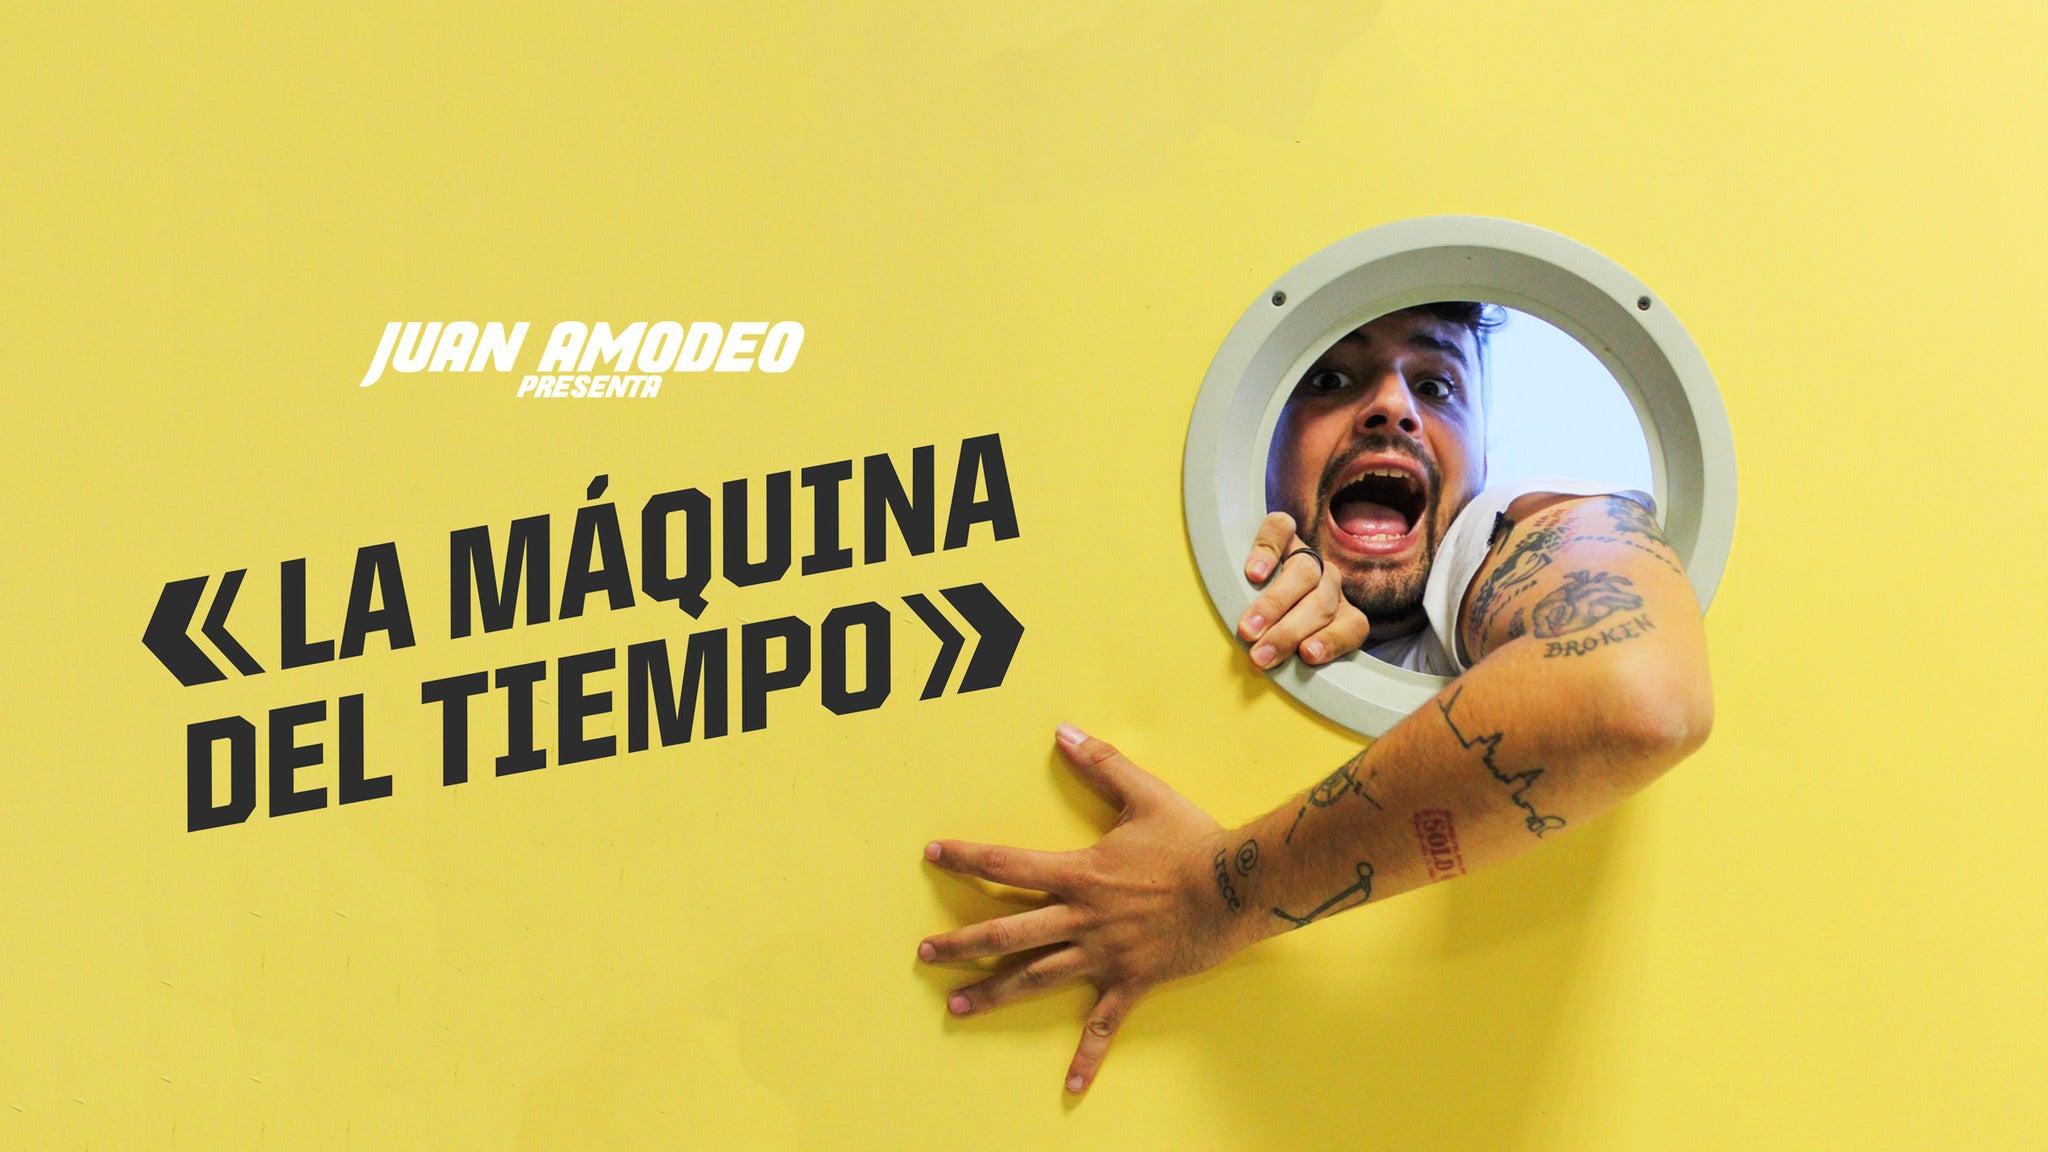 Juan Amodeo - La máquina del tiempo